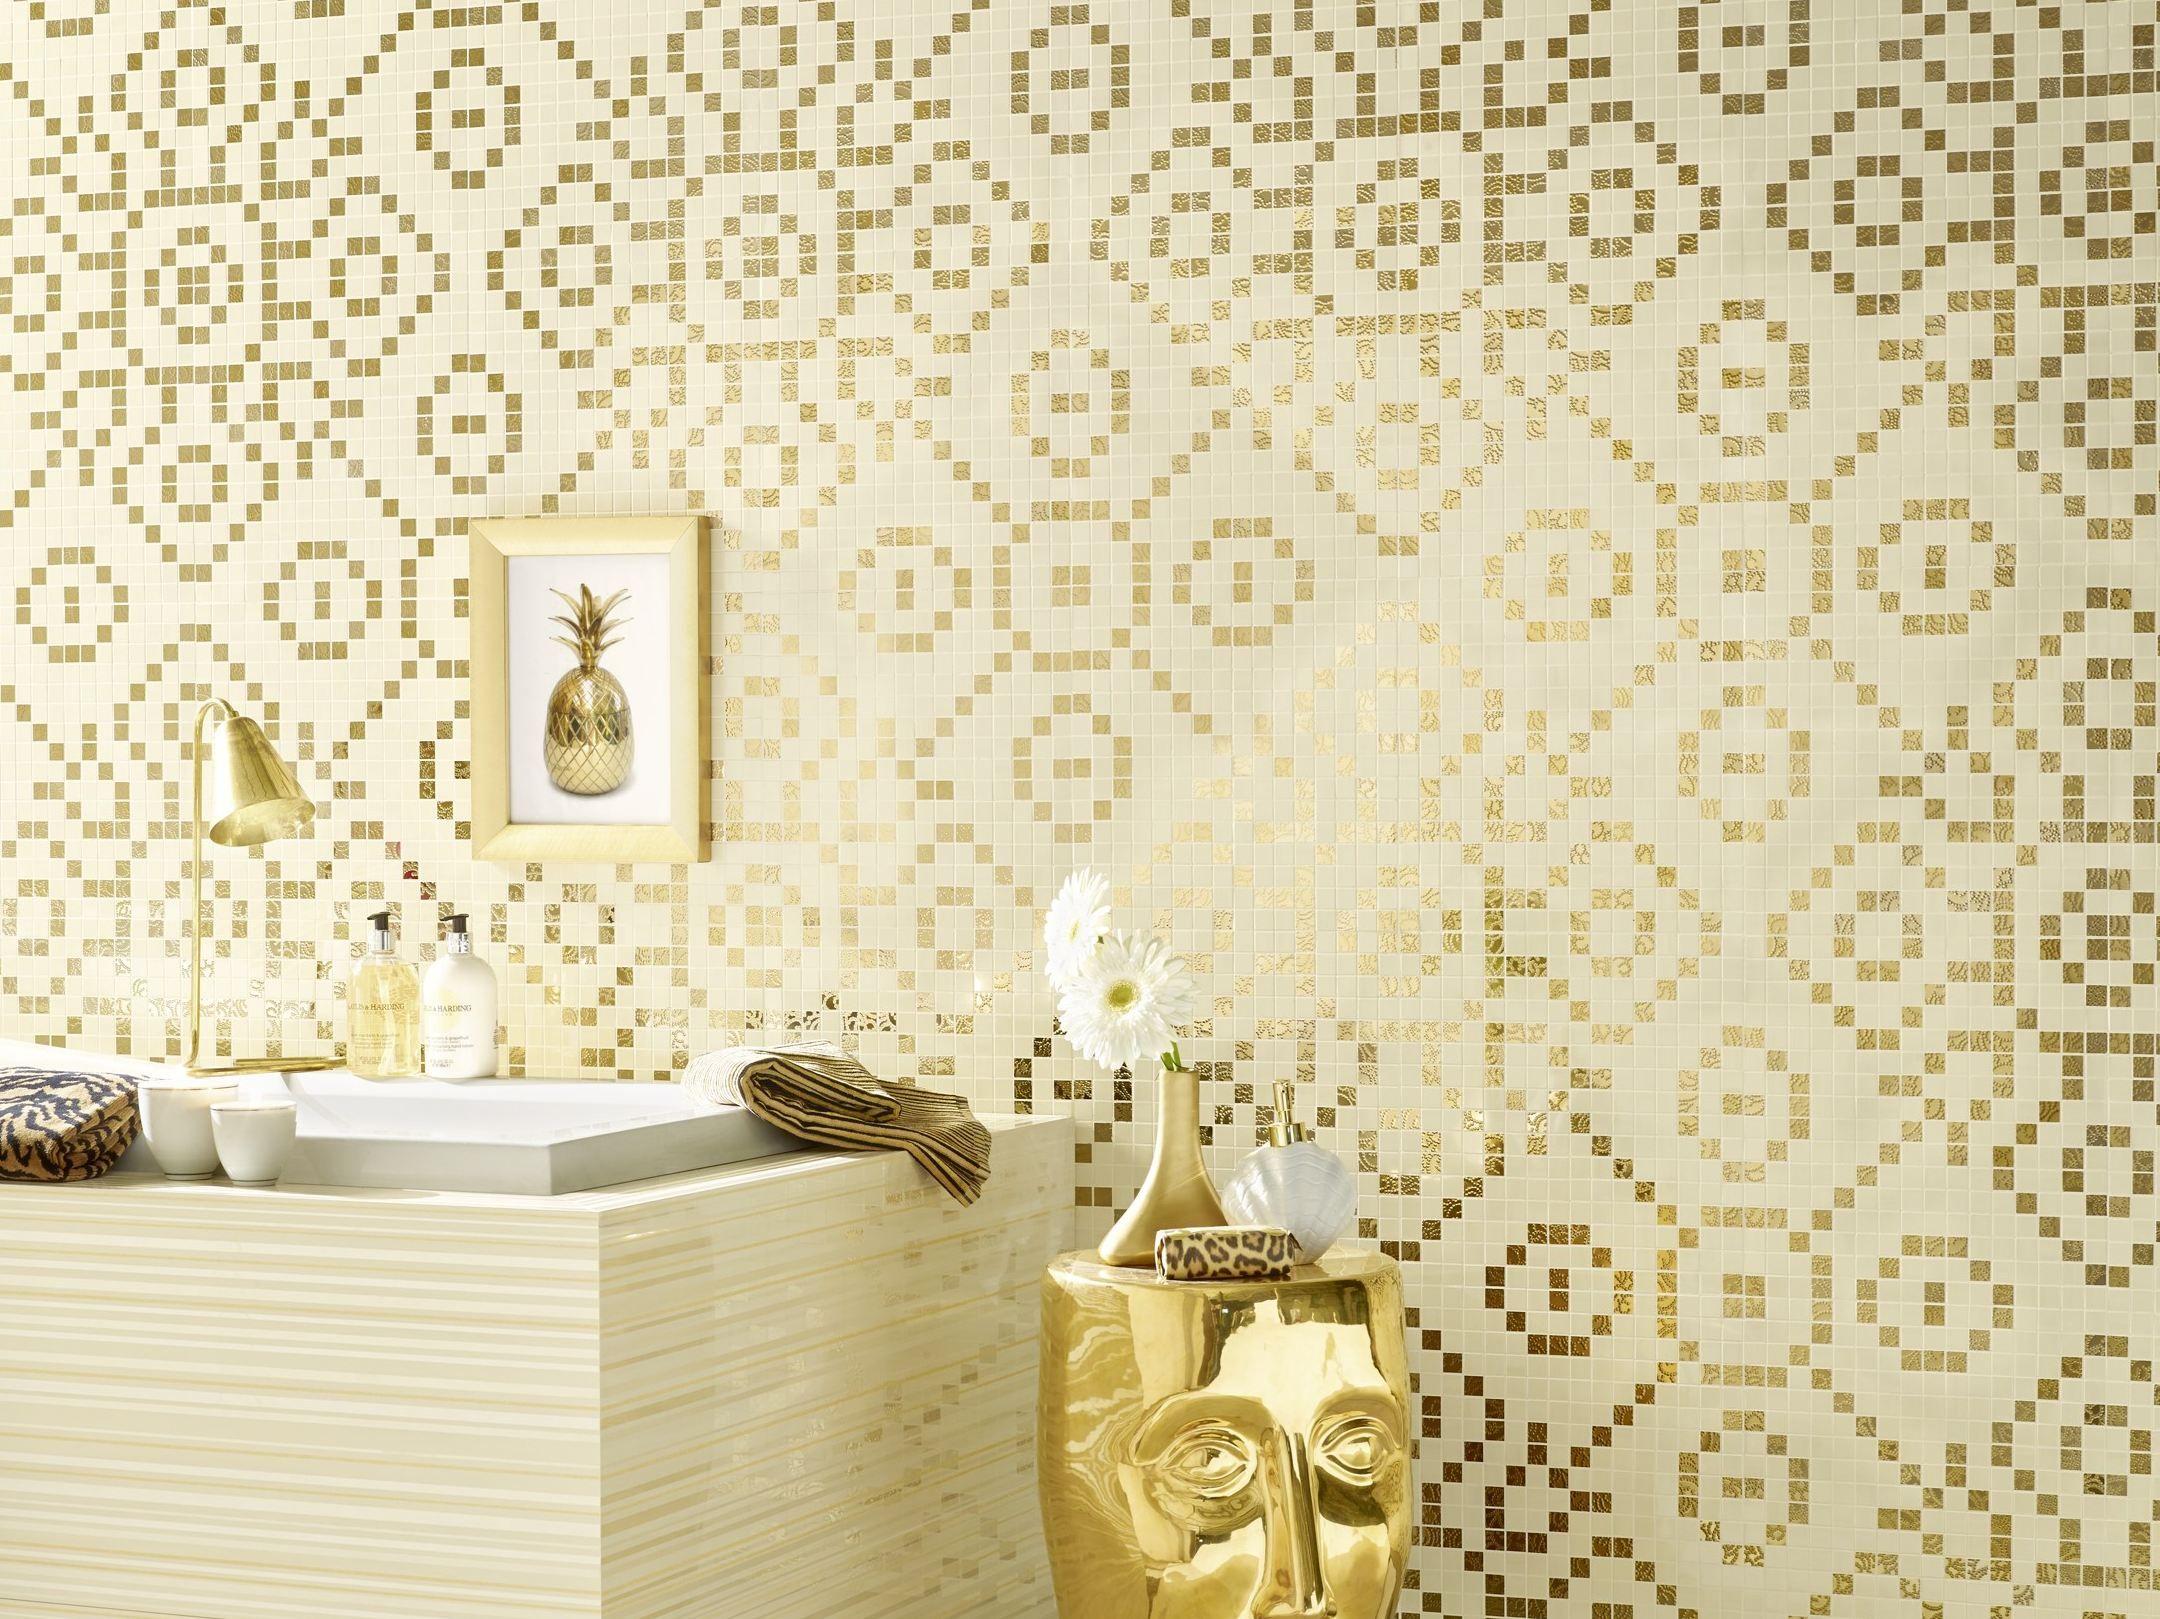 parfum mosaic by love tiles. Black Bedroom Furniture Sets. Home Design Ideas